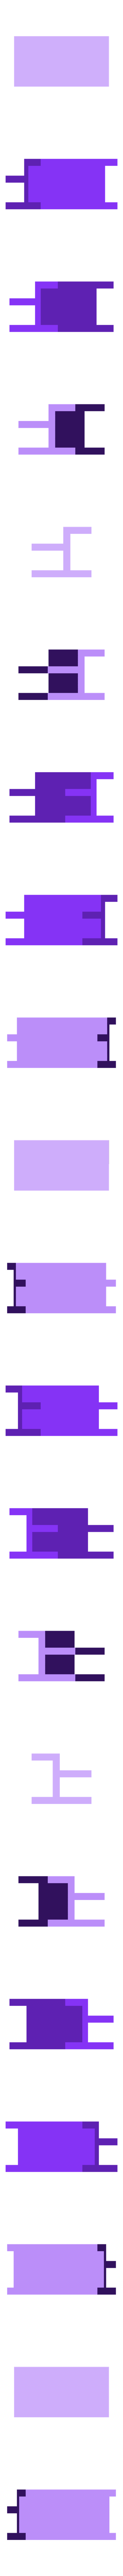 88 seat support.stl Download STL file Ratrod Pickup • 3D printing template, macone1